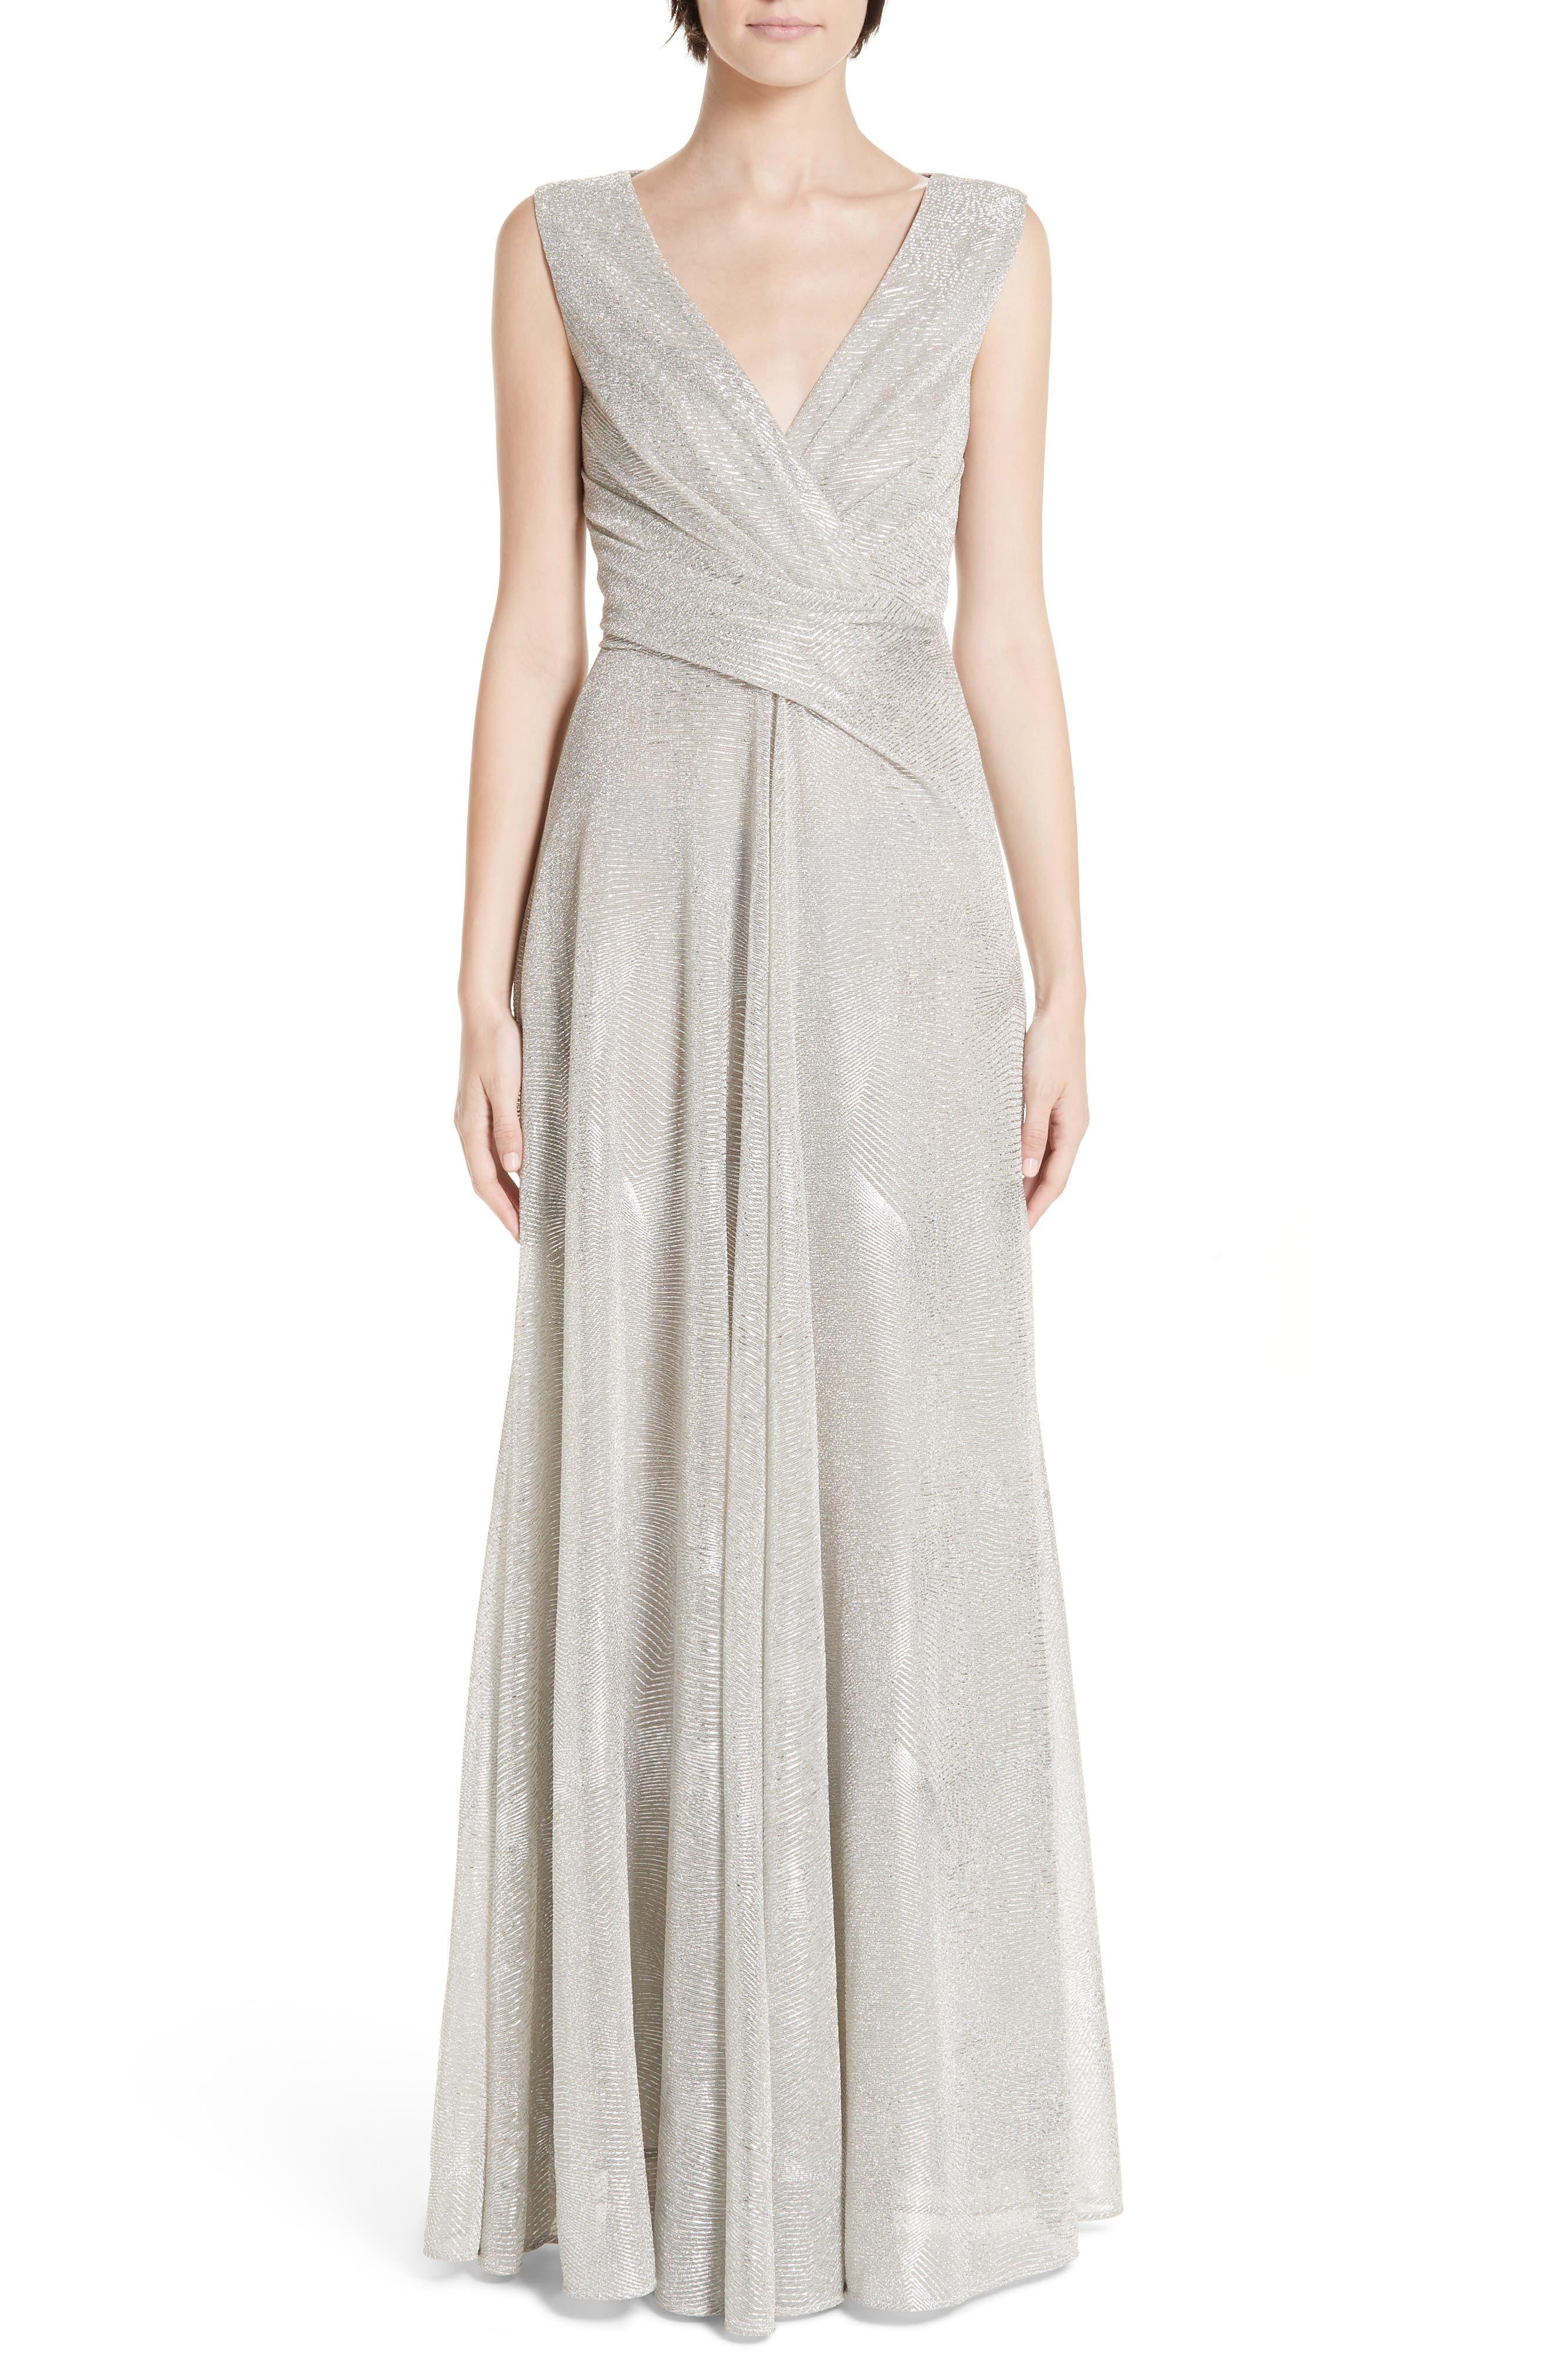 TALBOT RUNHOF V-Neck Sleeveless A-Line Metallic Evening Gown in Platinum